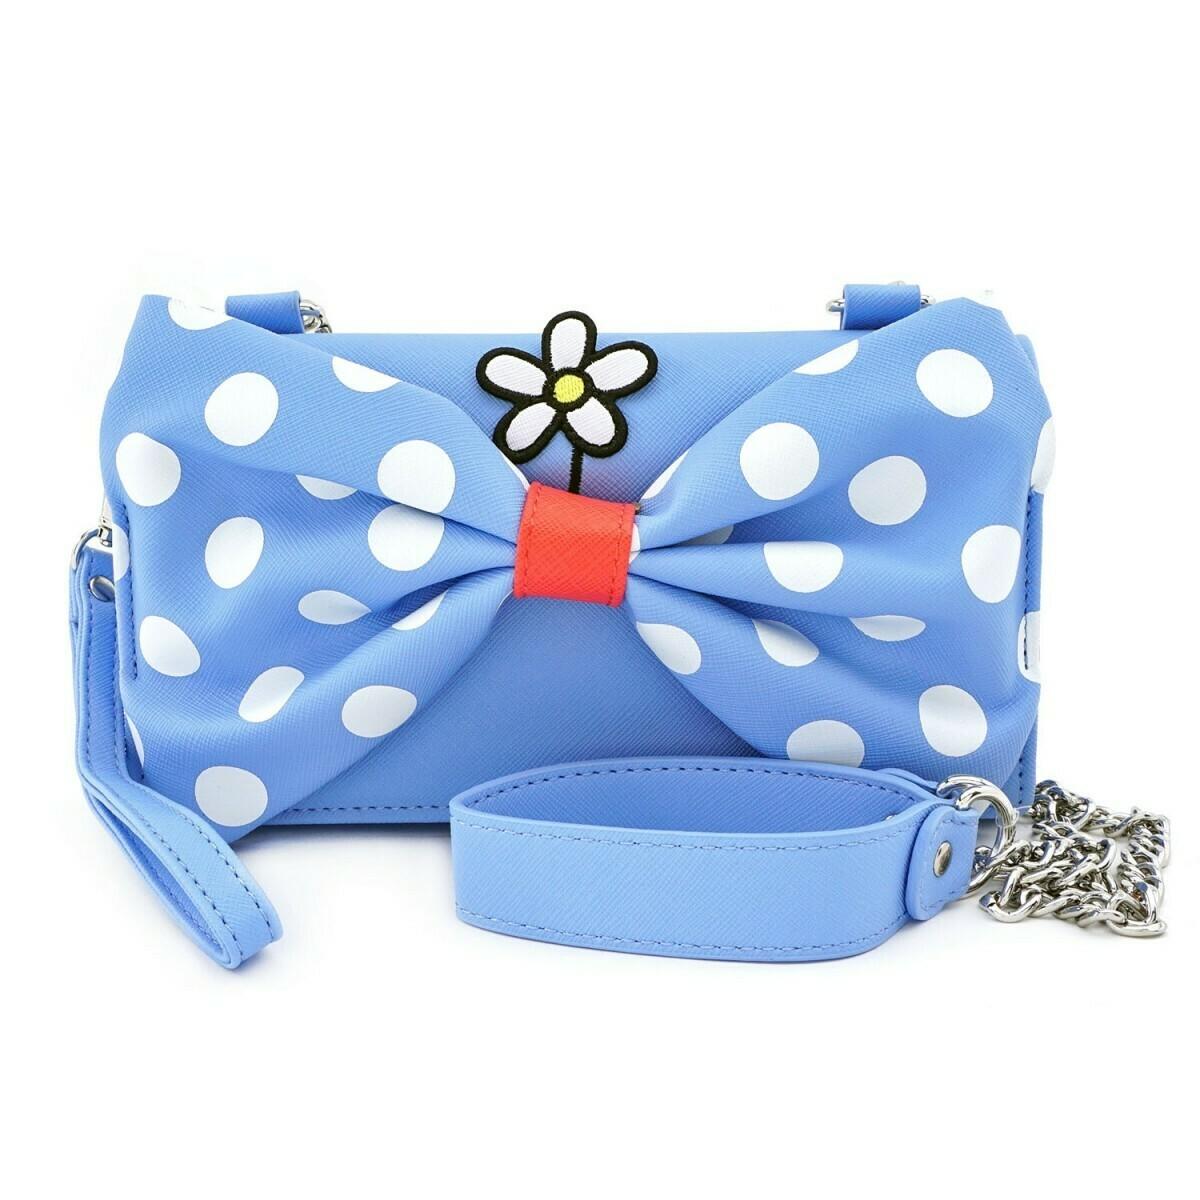 Bolsa Cartera Minnie Mouse AM08